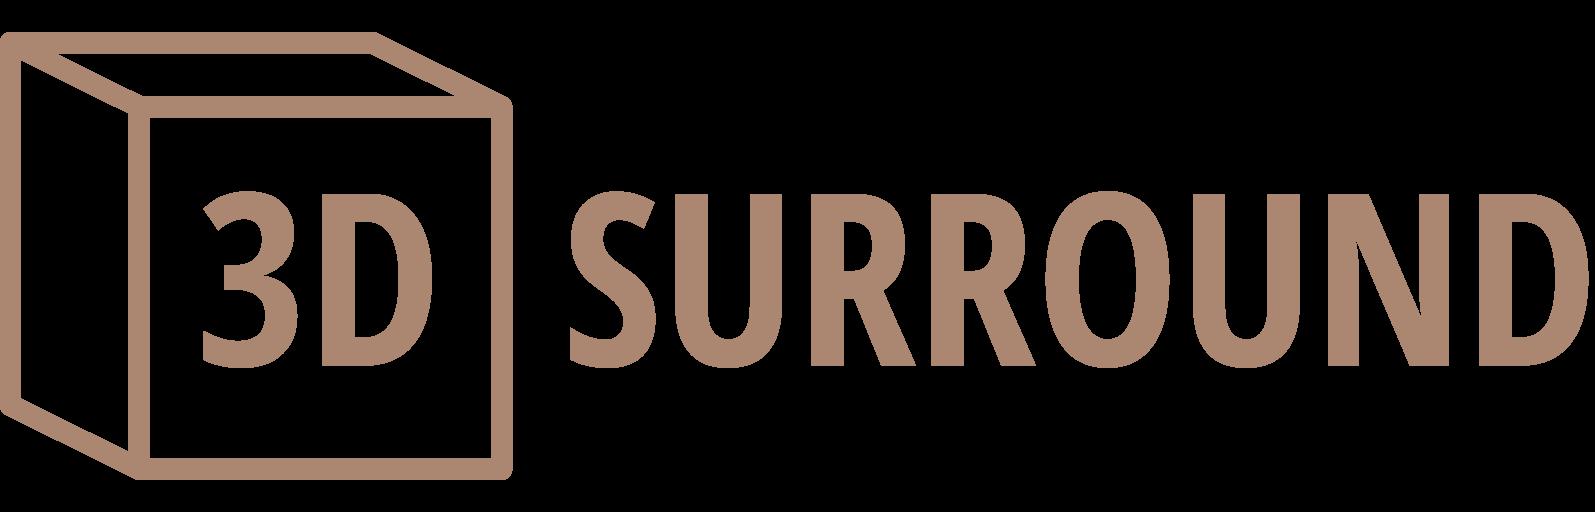 3d_cube_surround_ocre2